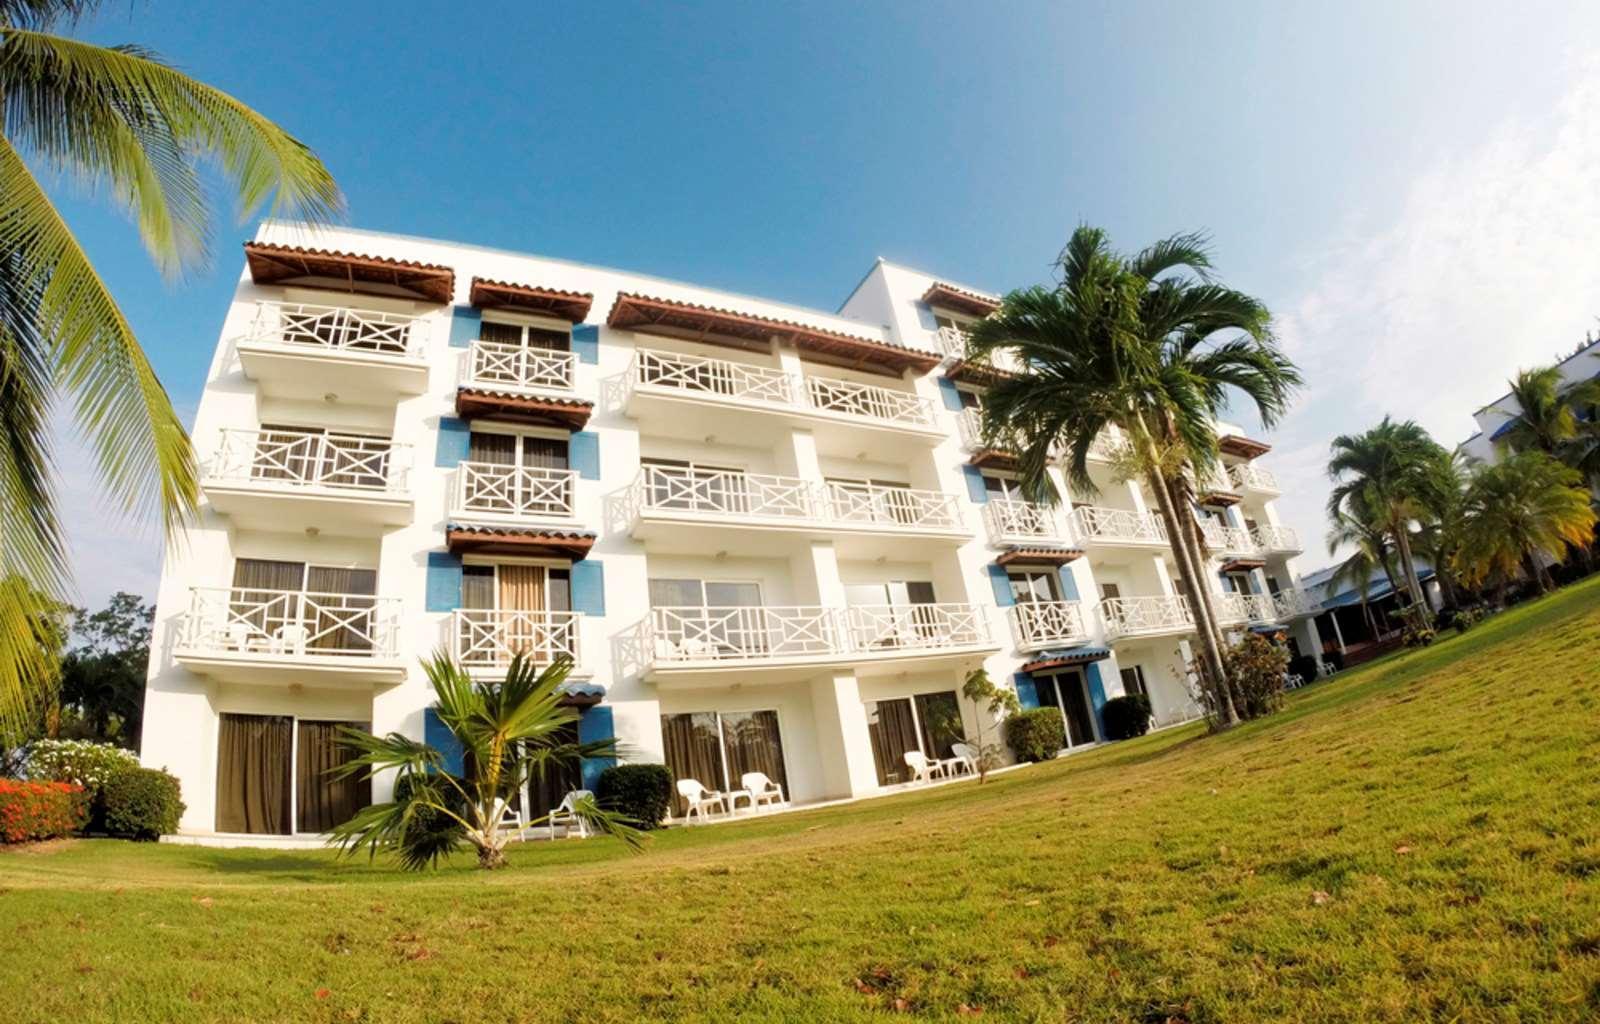 Playa Blanca Beach Resort   All Inclusive